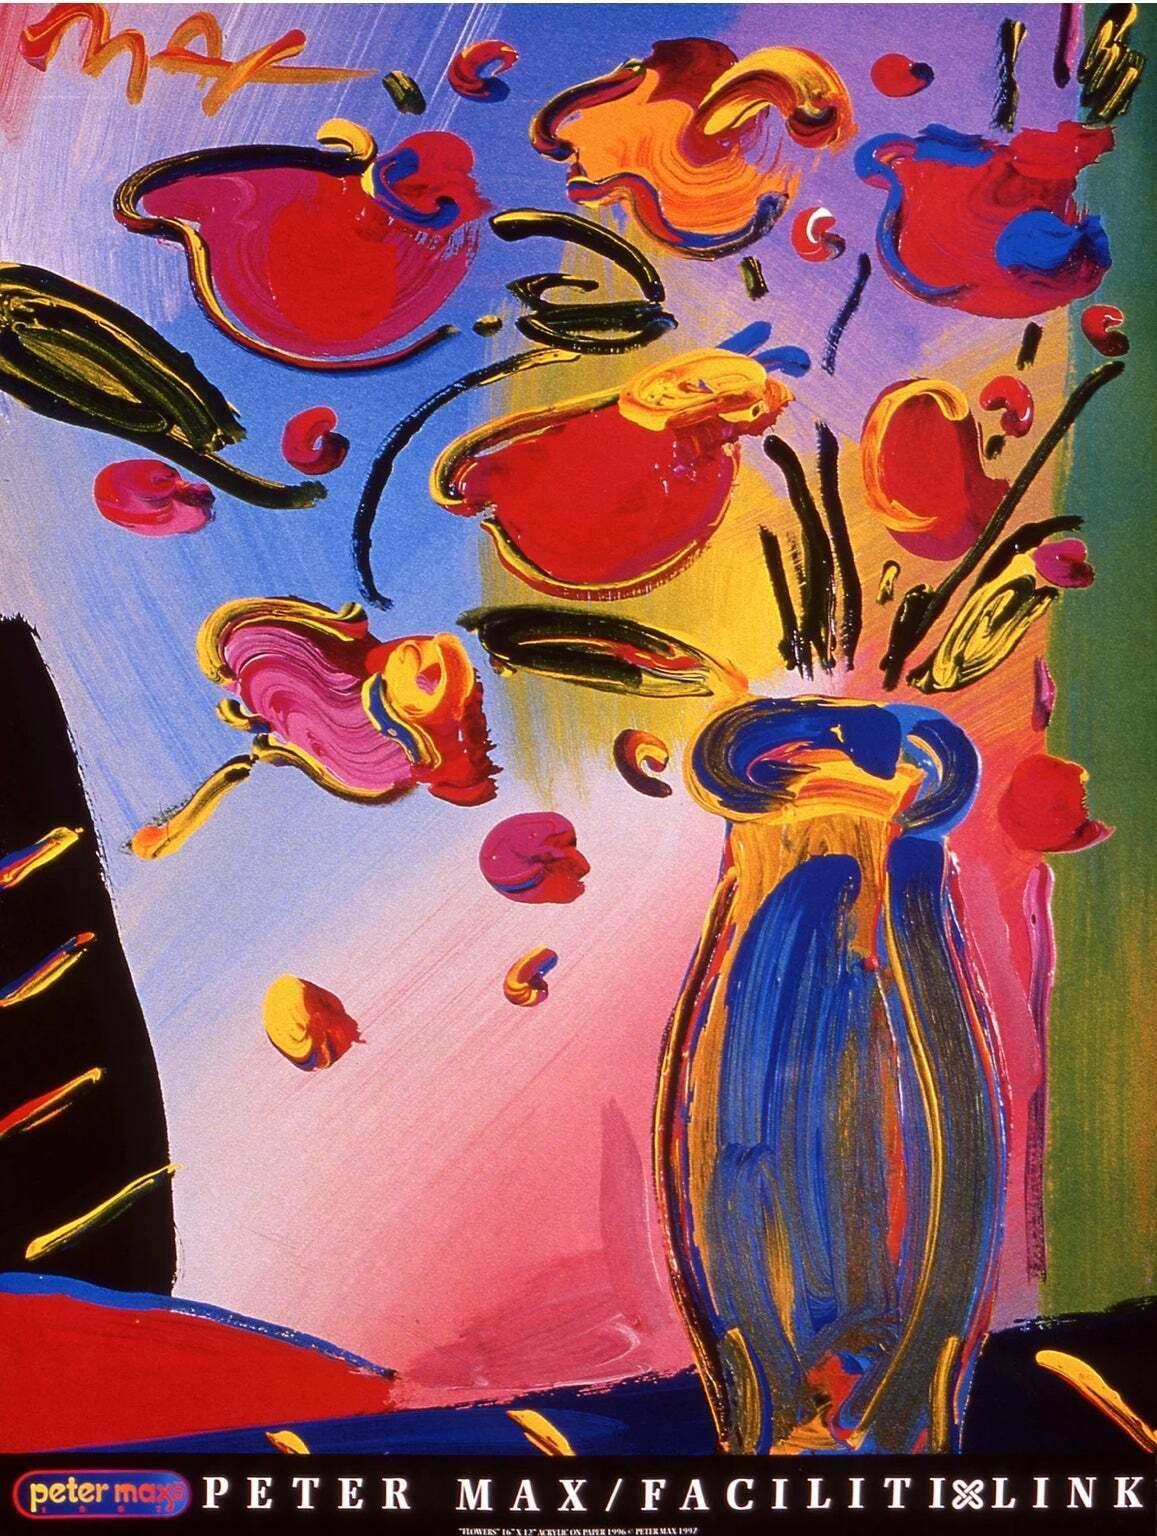 FACILITI-LINK FLOWERS, Original 1997 Lithograph, Peter Max -SIGNED